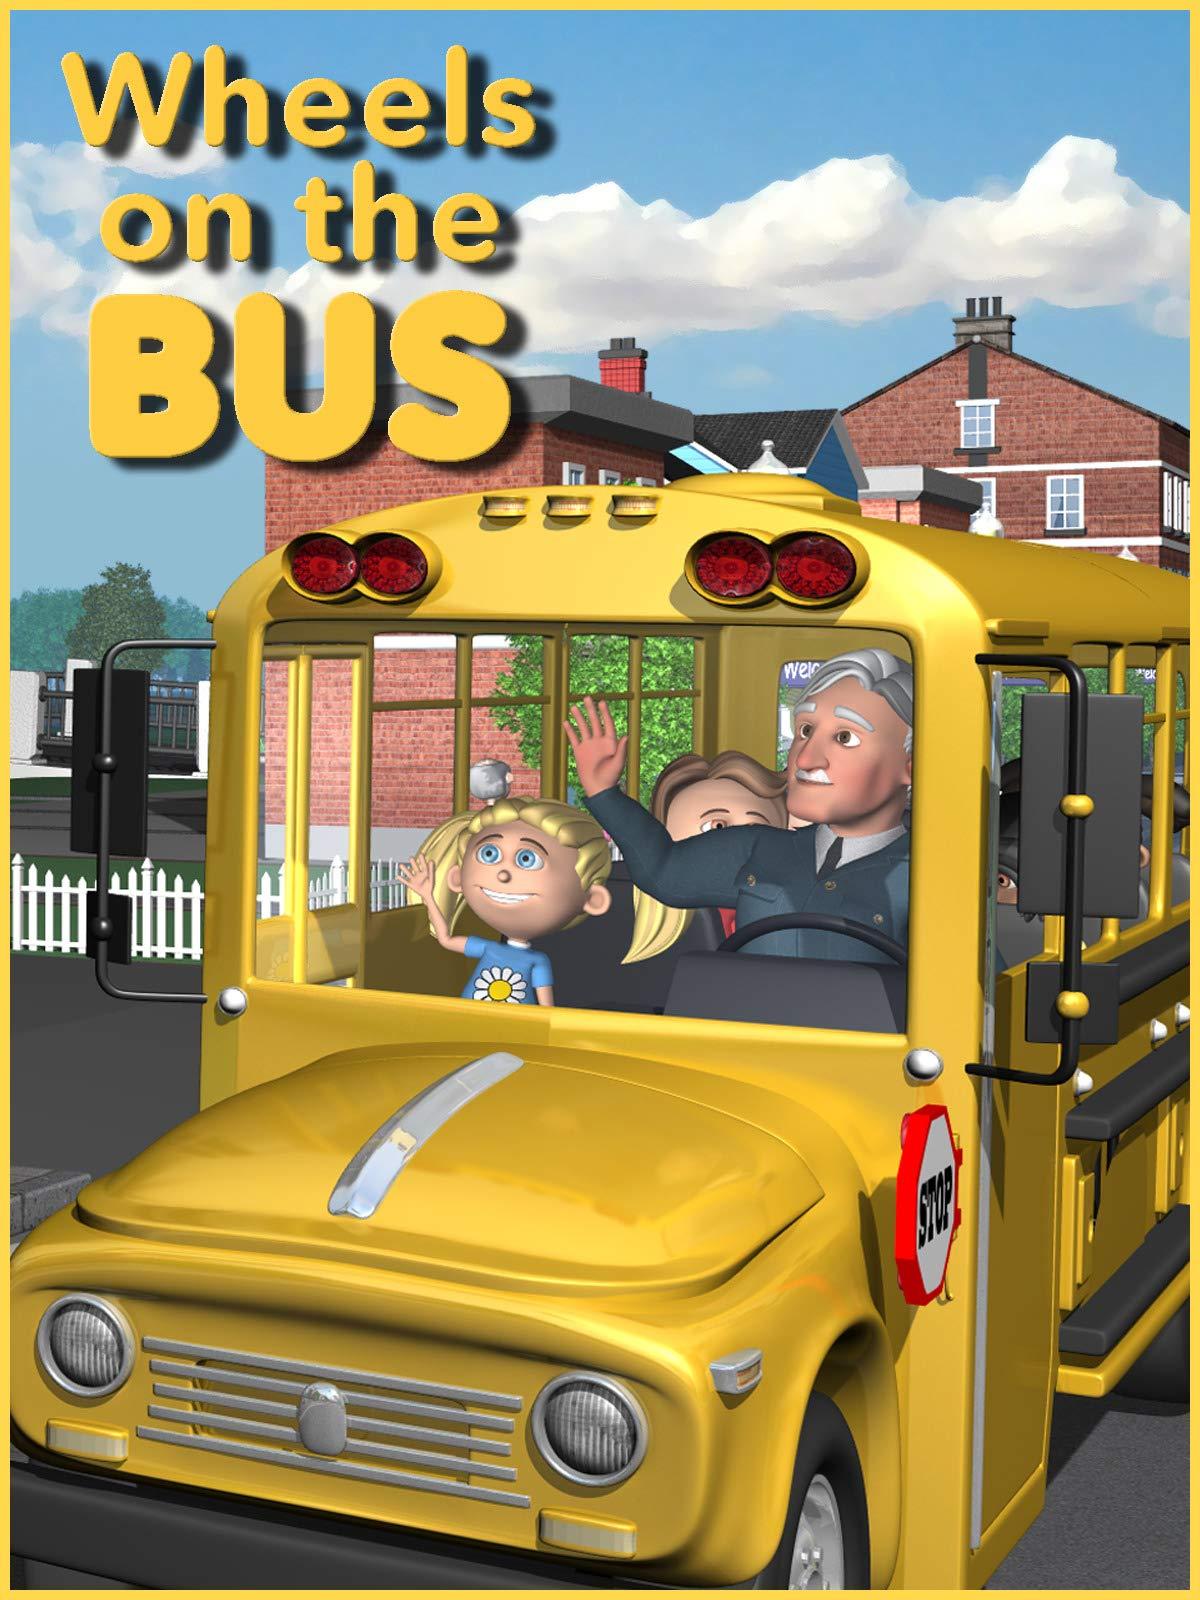 Wheels on the bus kidspace studios on Amazon Prime Video UK